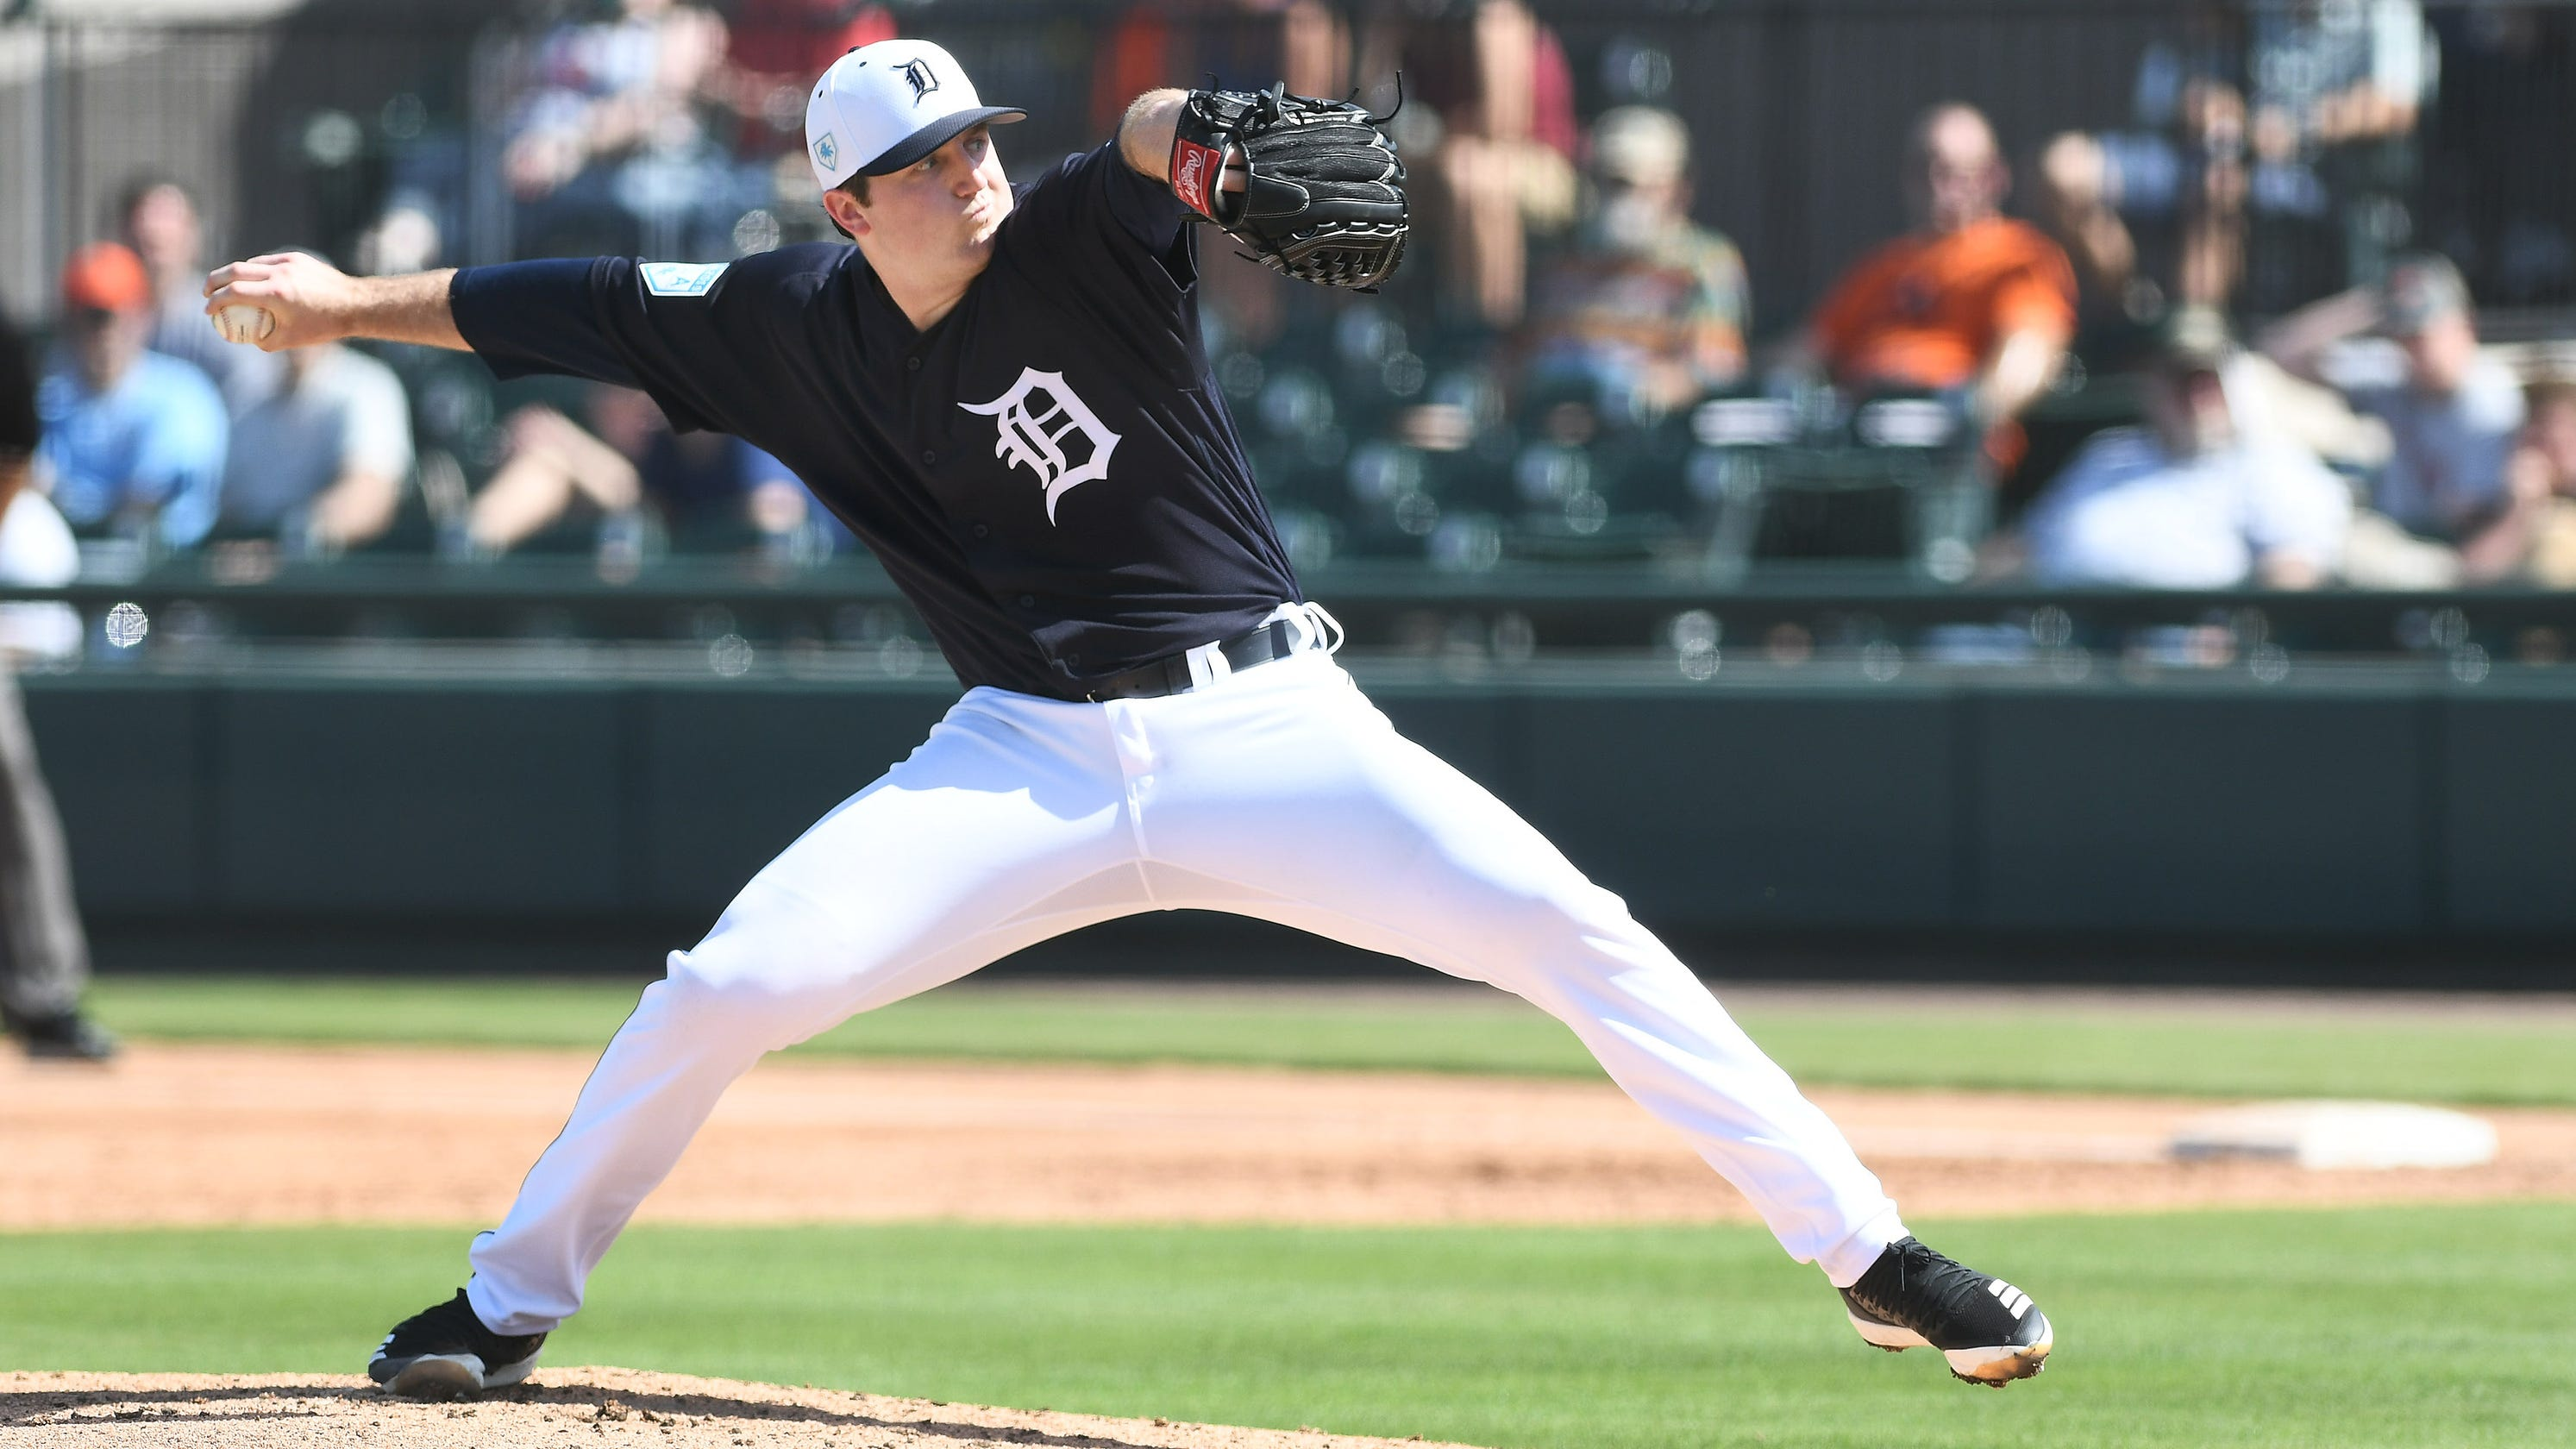 Detroit News 2019 Post Trade Deadline Top 50 Tigers Prospects